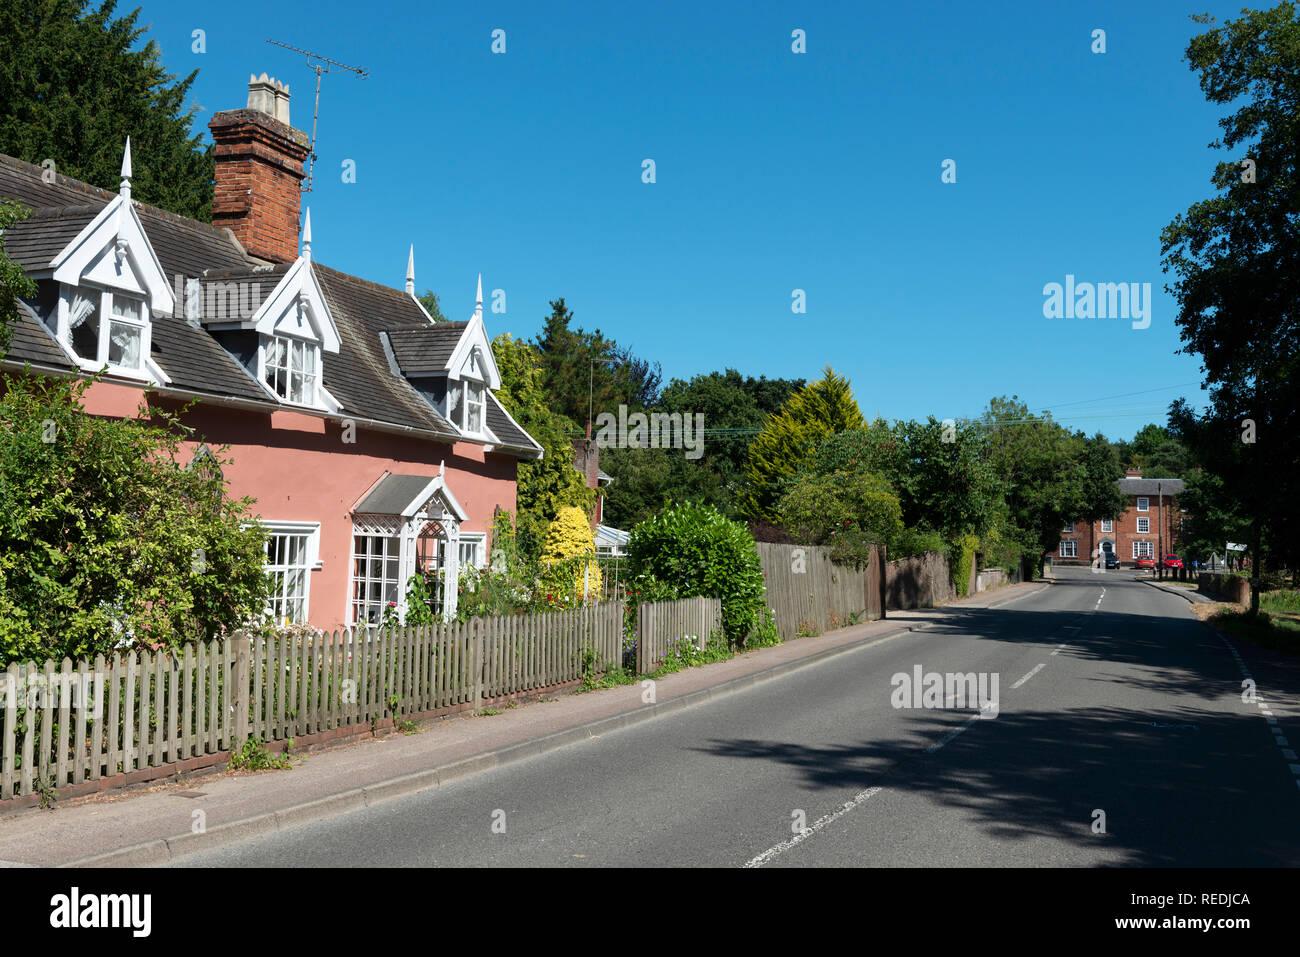 Walpole, Suffolk, England. - Stock Image